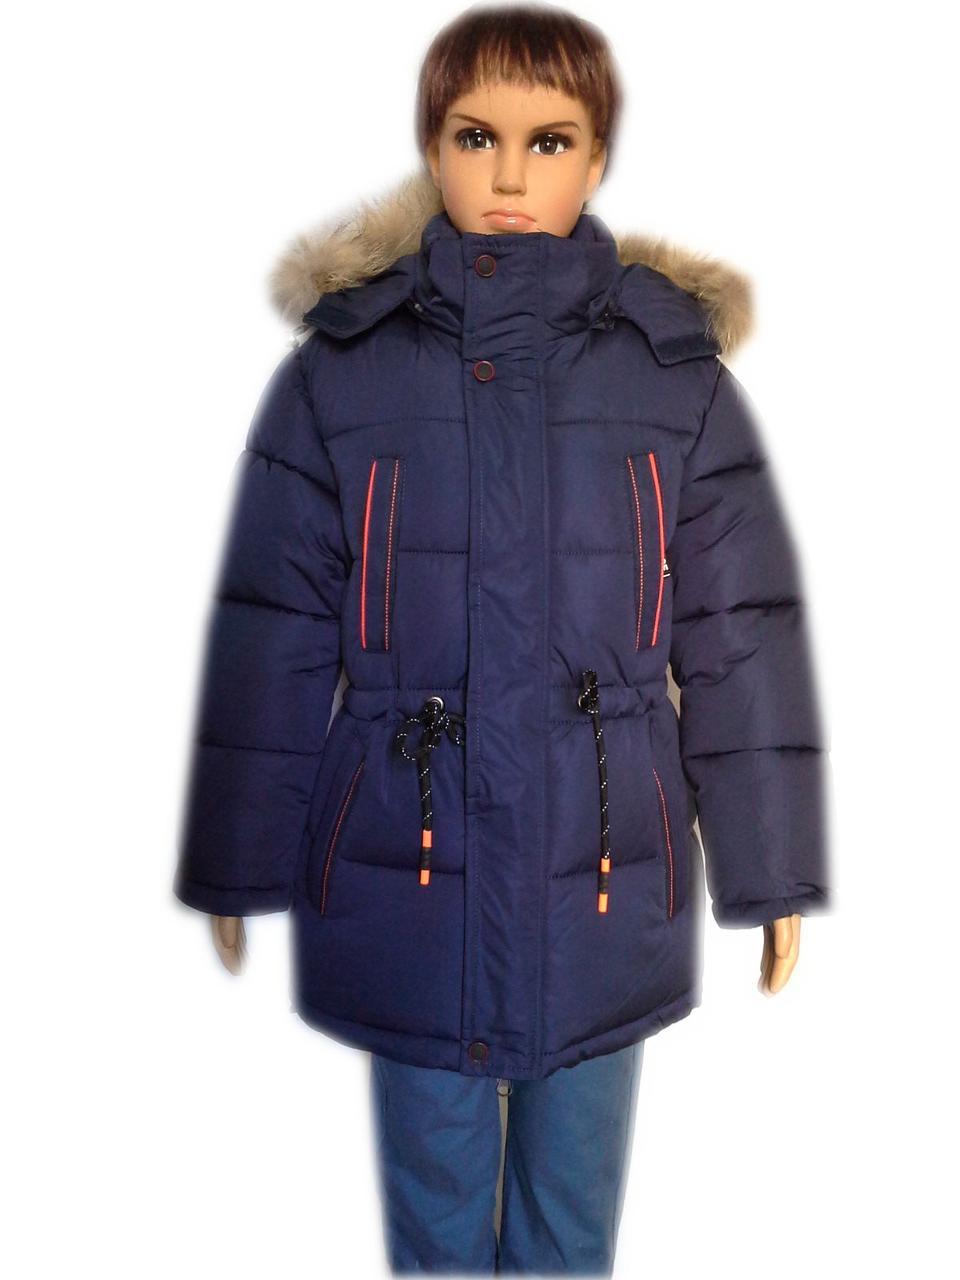 Куртка зимняя 6-10 лет